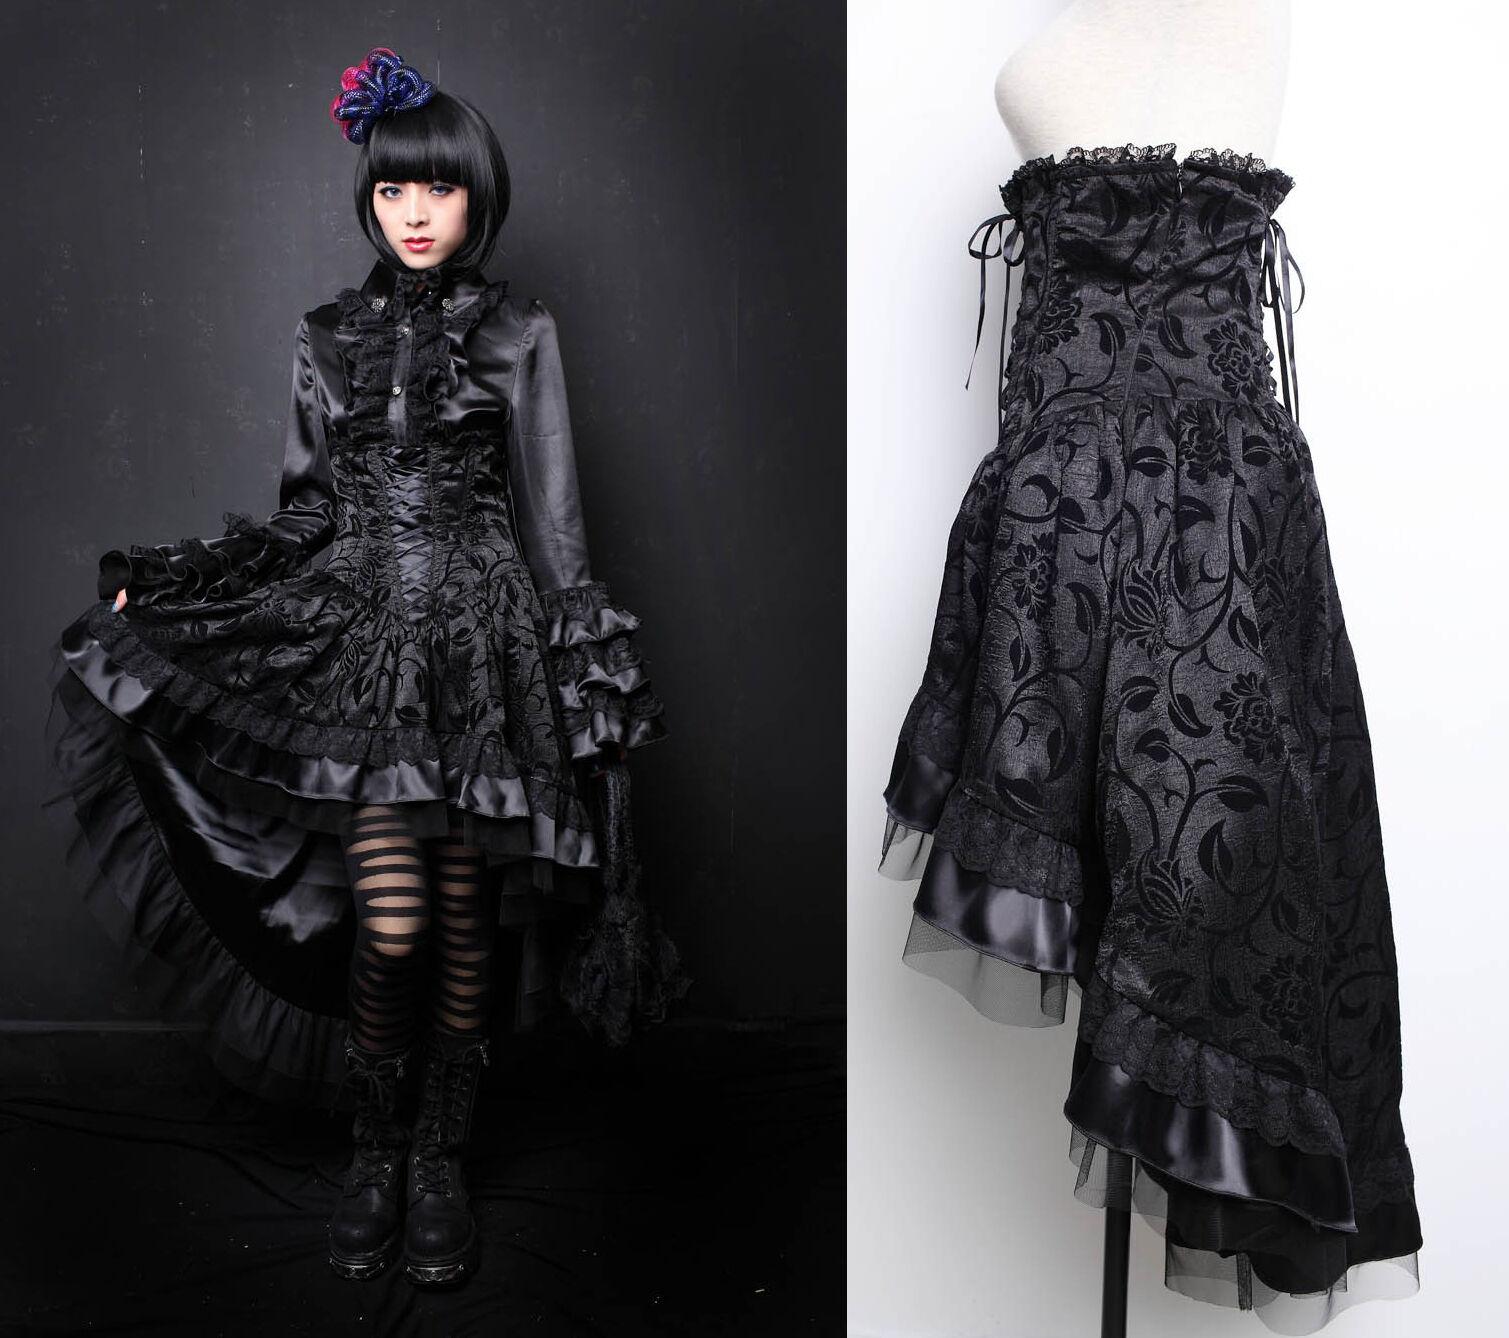 Pentagramme High Waist Gothic Lolita Skirt Gothic Victorian Clothing J020048